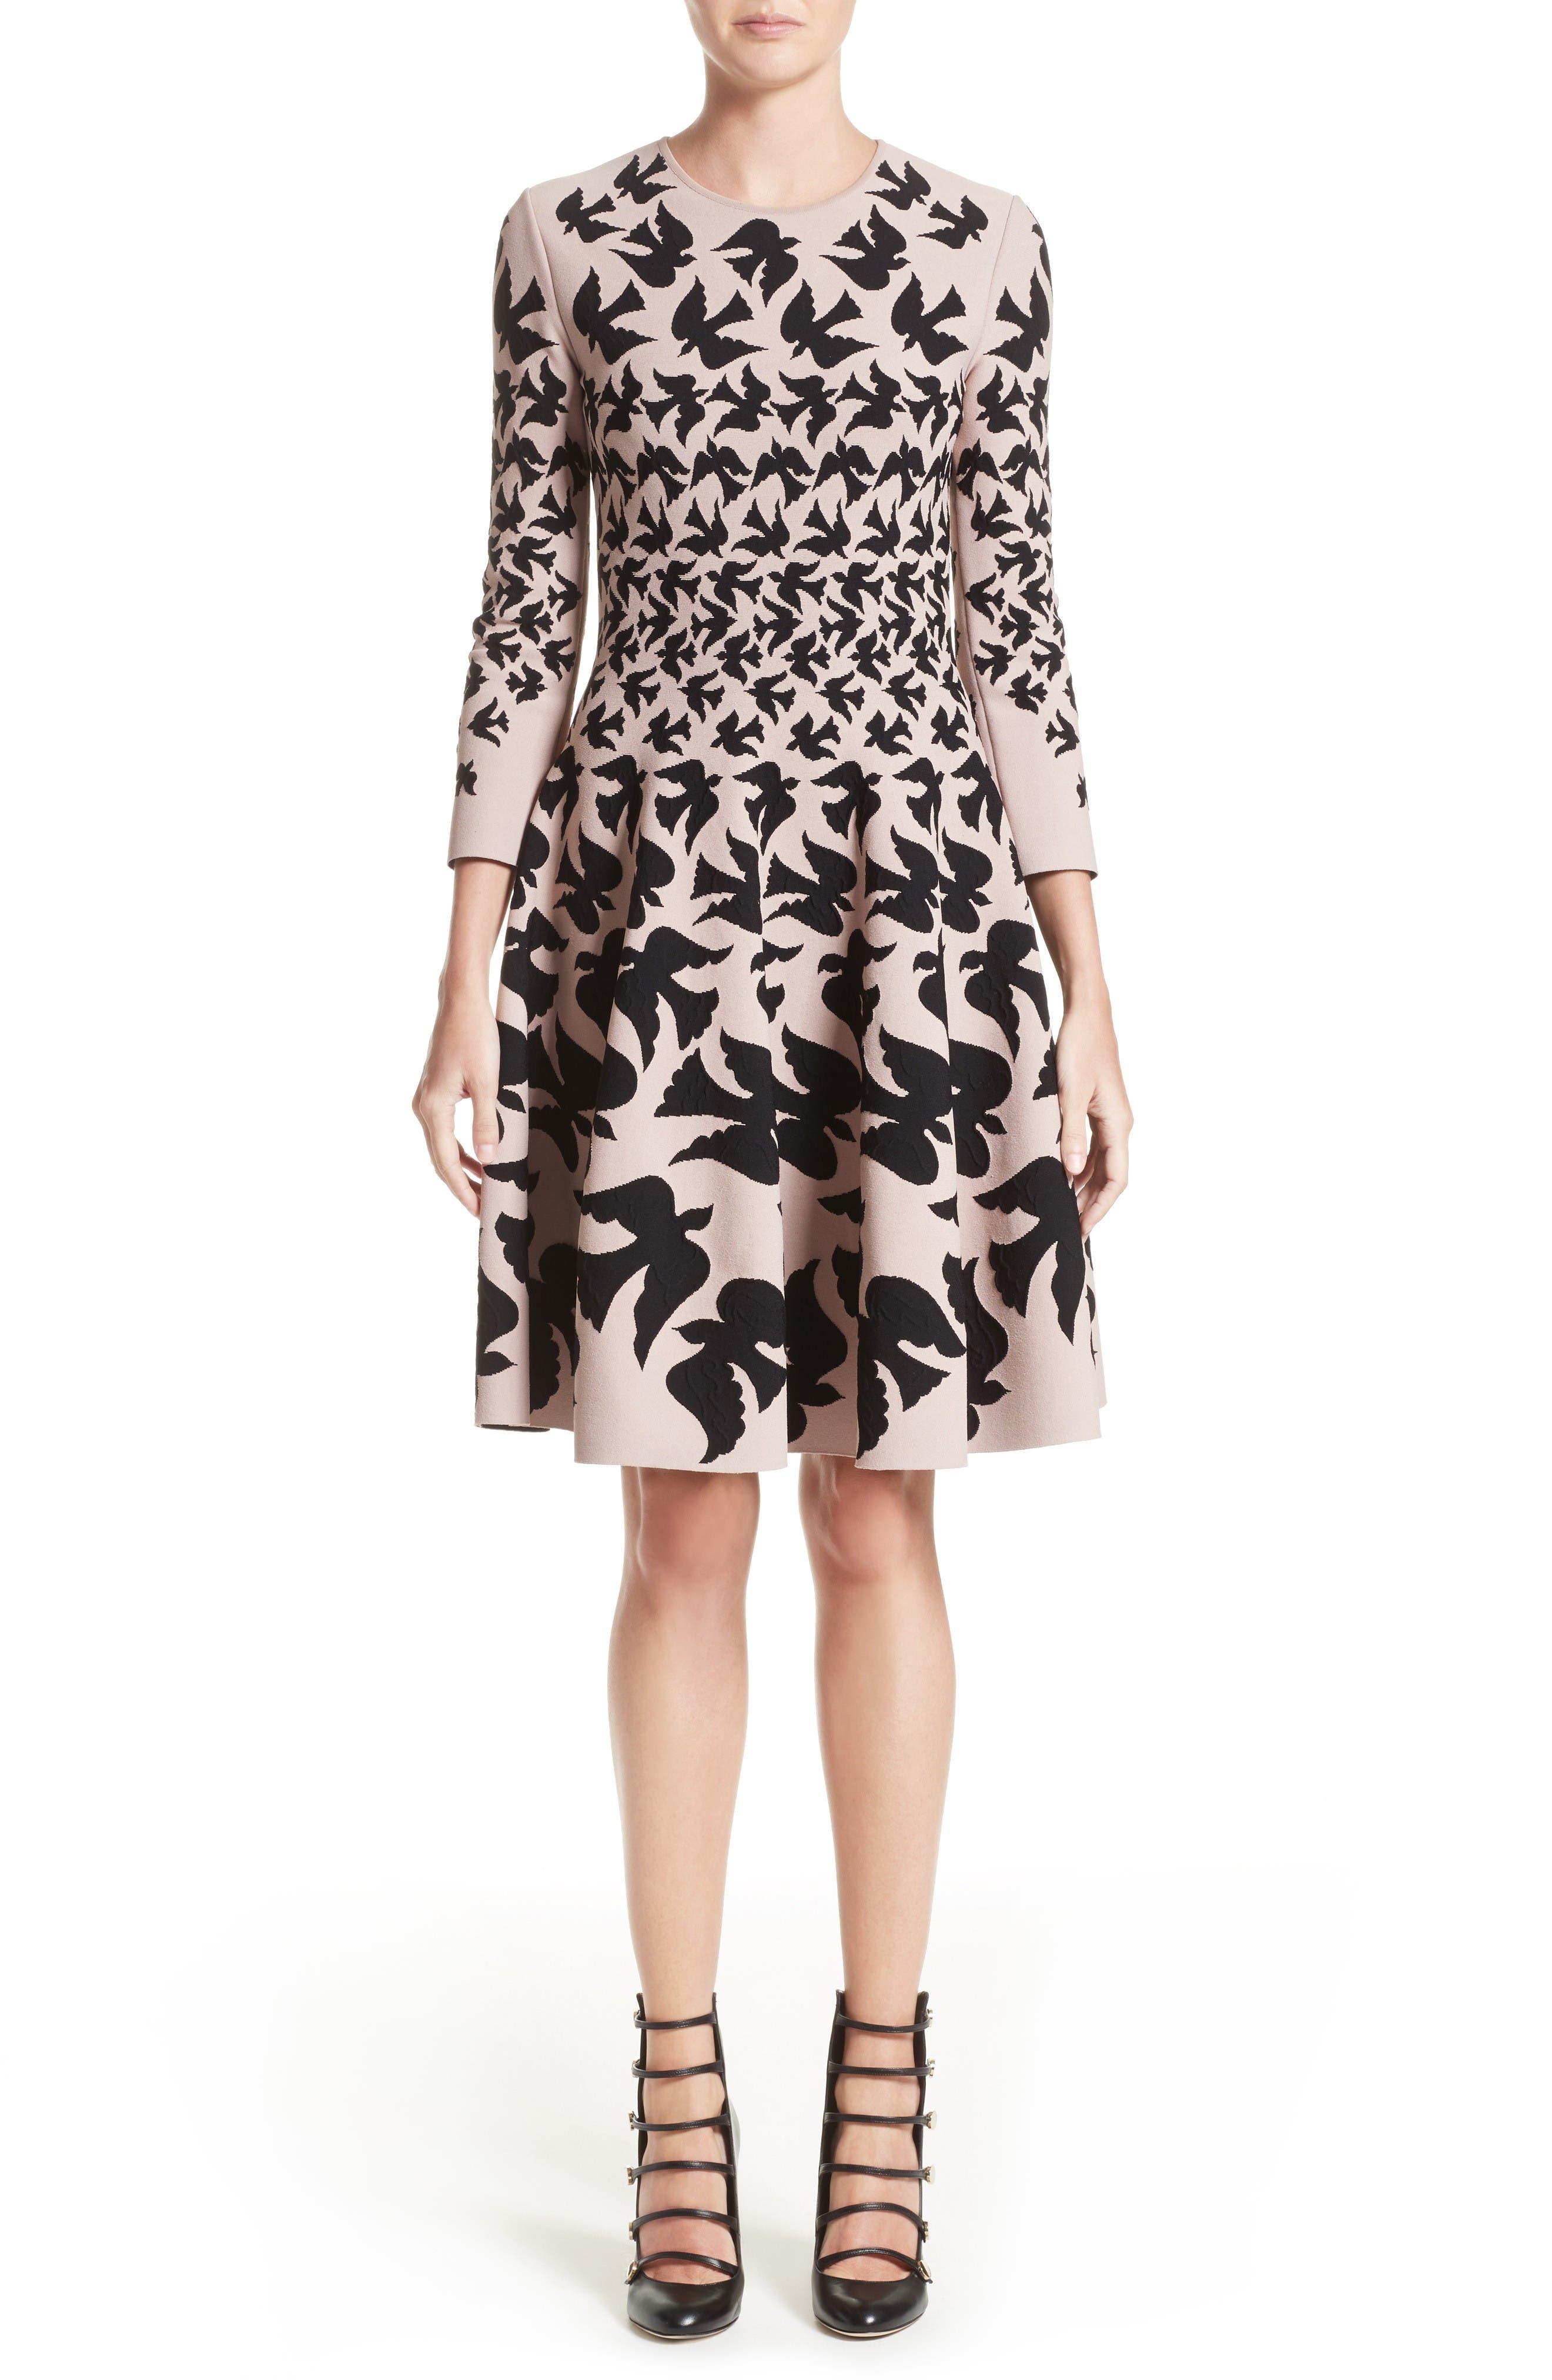 Alternate Image 1 Selected - Alexander McQueen Swallow Jacquard Dress